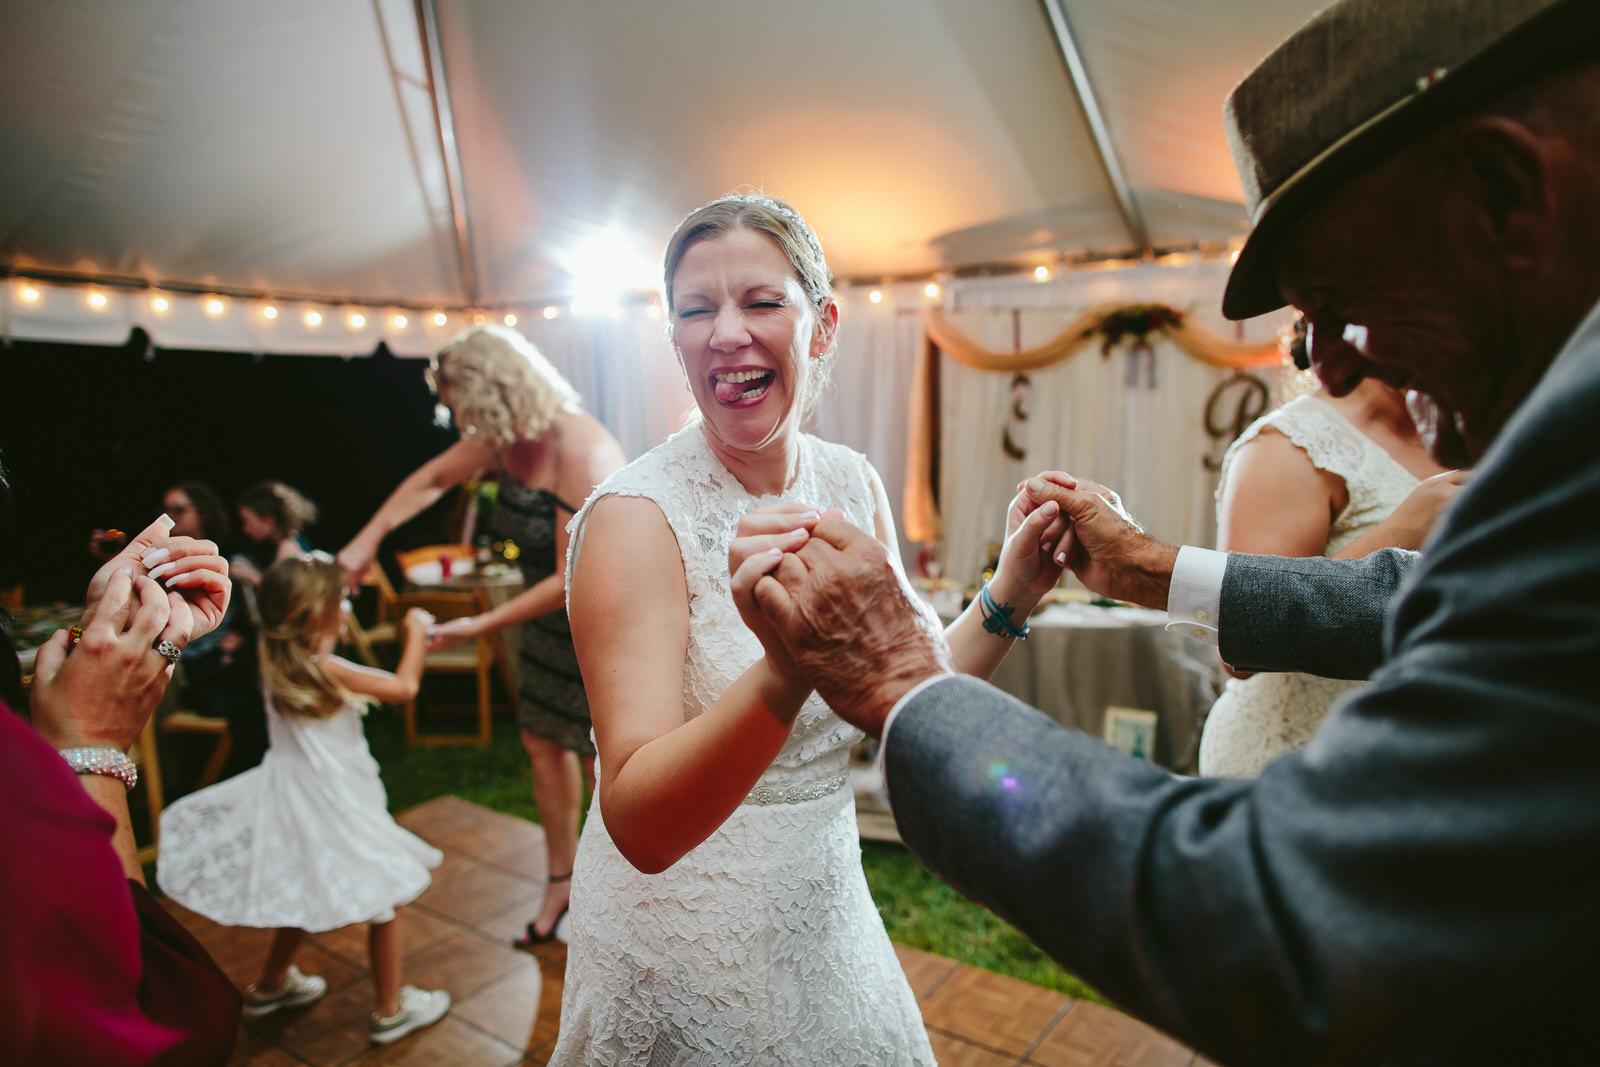 wedding_reception_backyard_pinecrest_tiny_house_photo-55.jpg